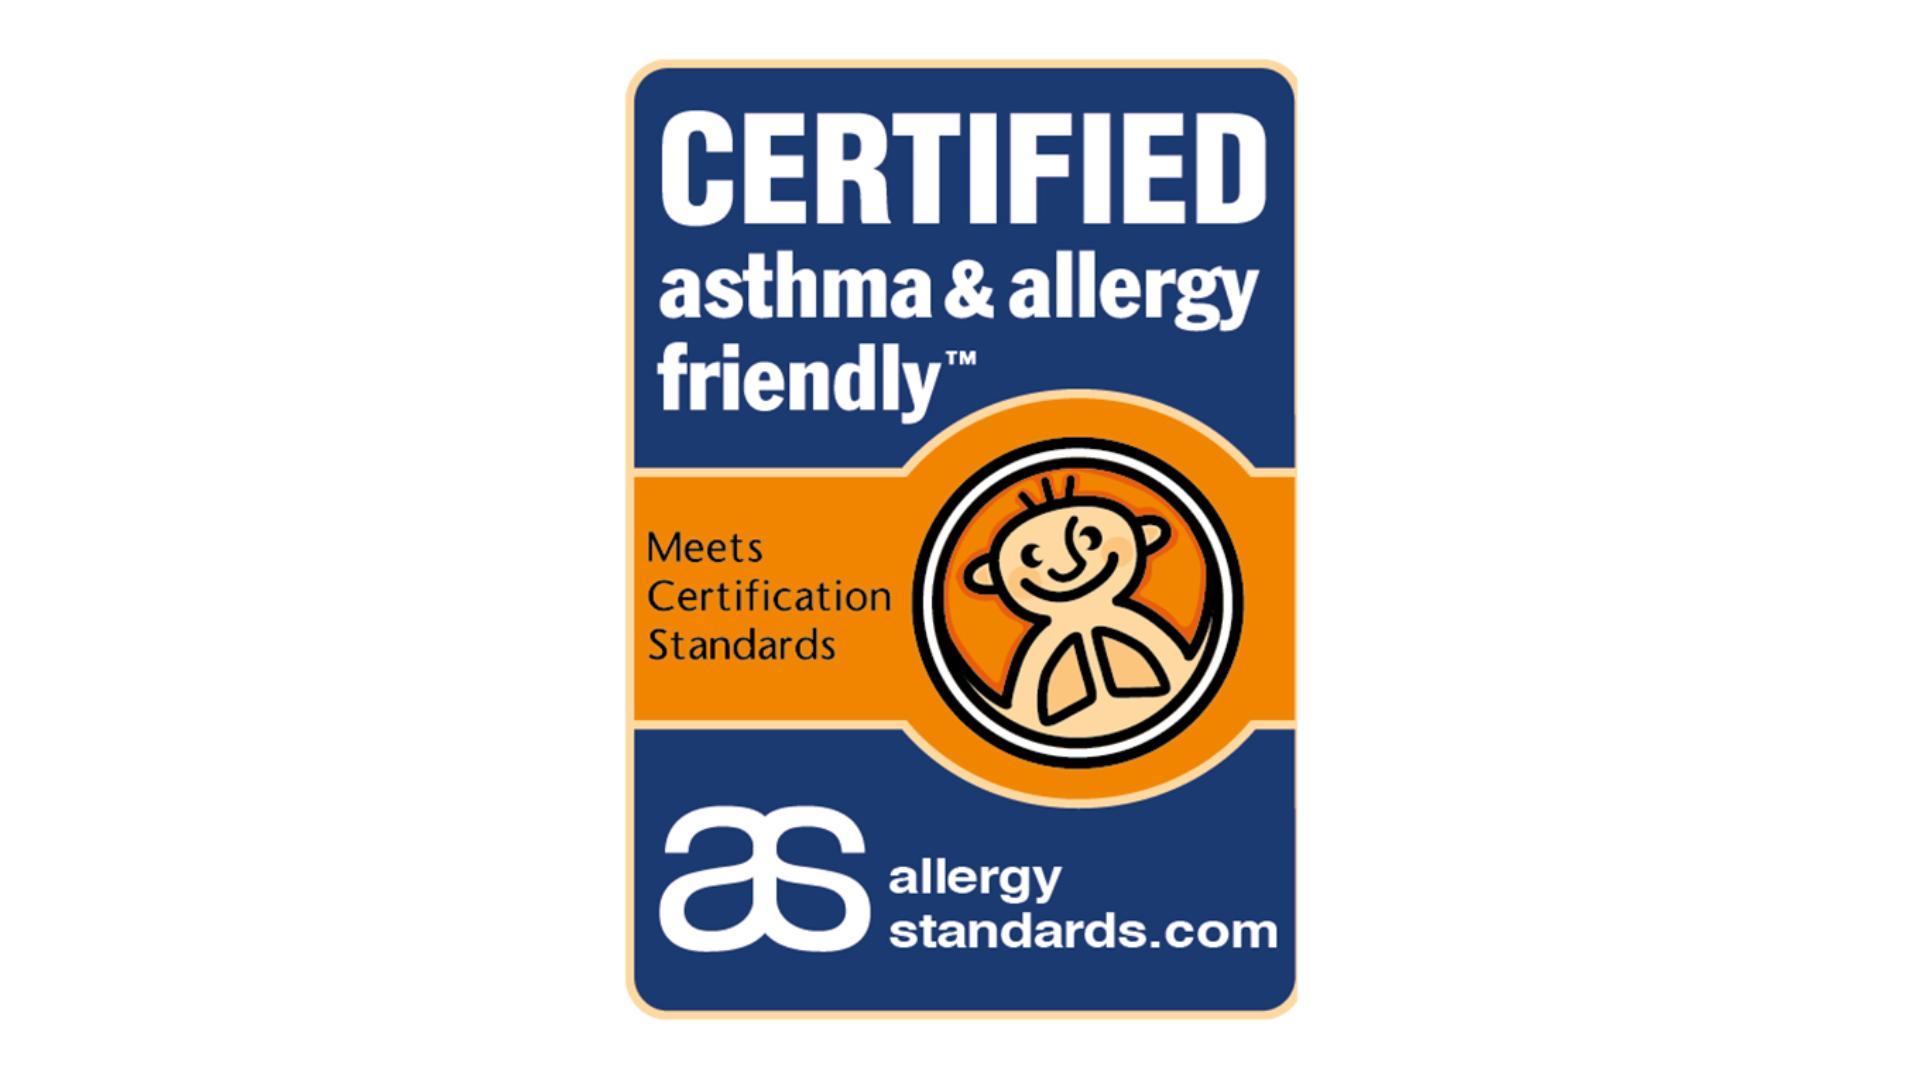 Allergy Standards Limited logo